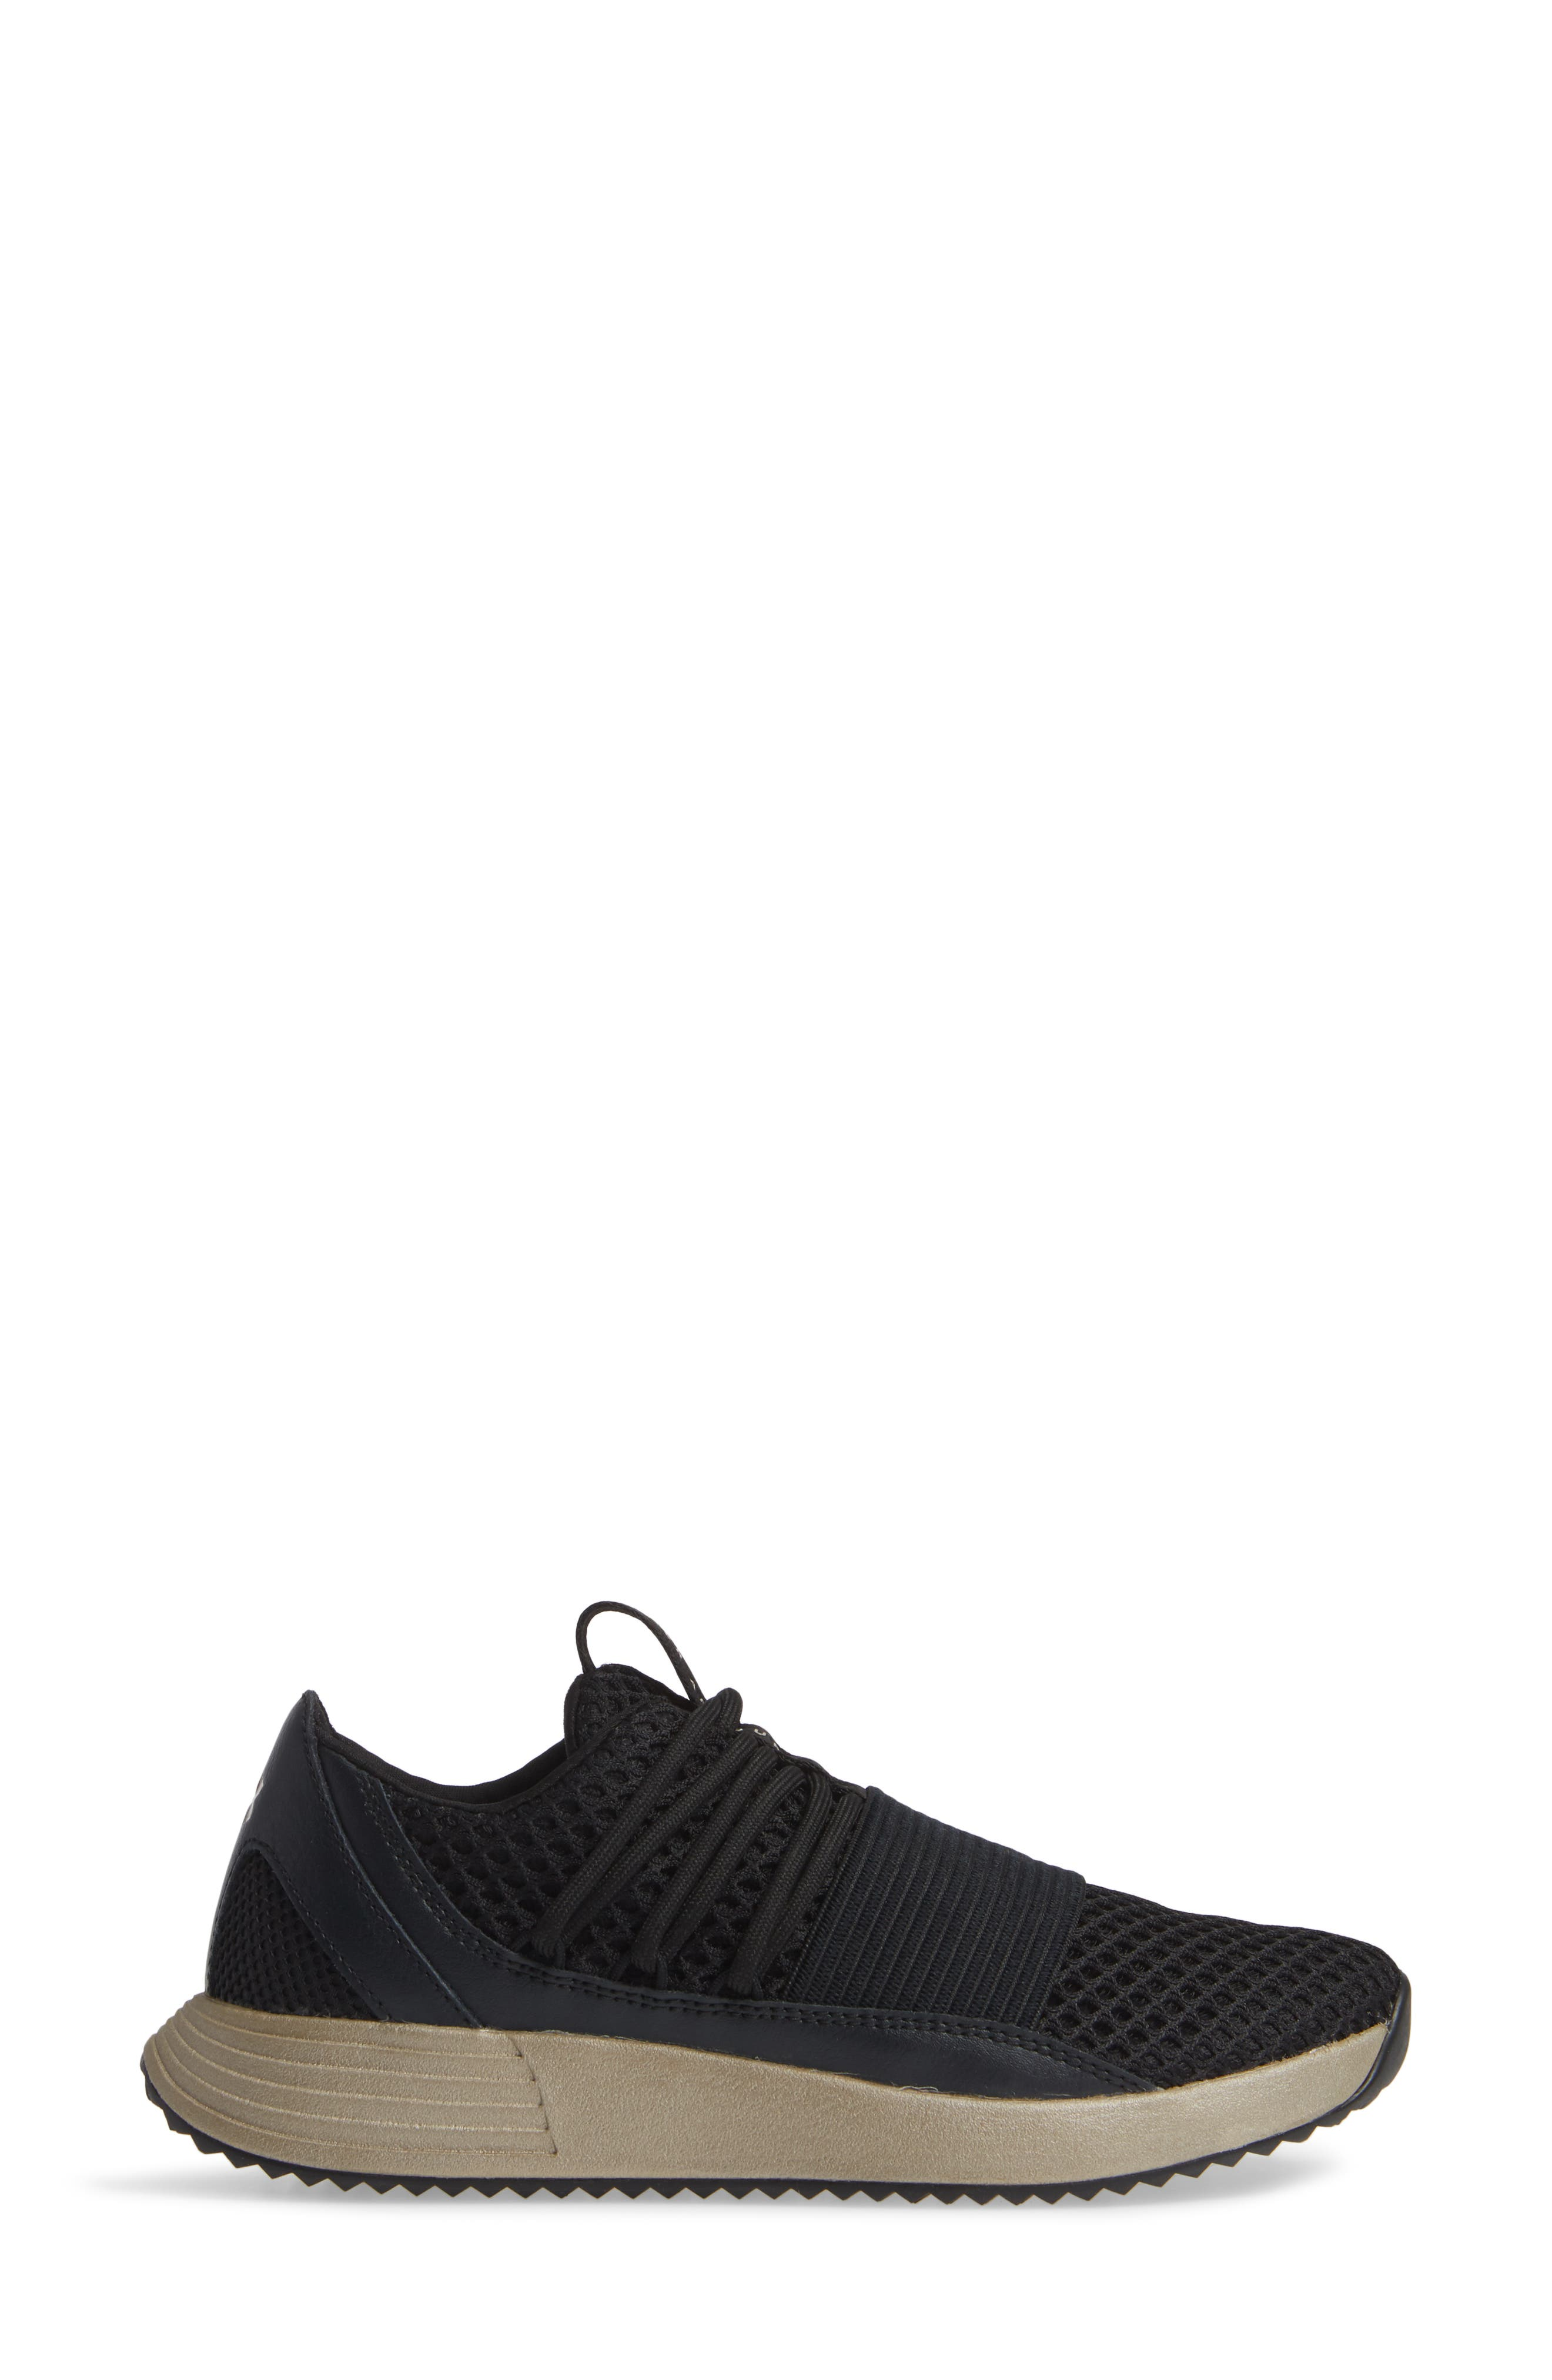 Breathe Lace X NM Sneaker,                             Alternate thumbnail 3, color,                             BLACK/ METALLIC FADED GOLD